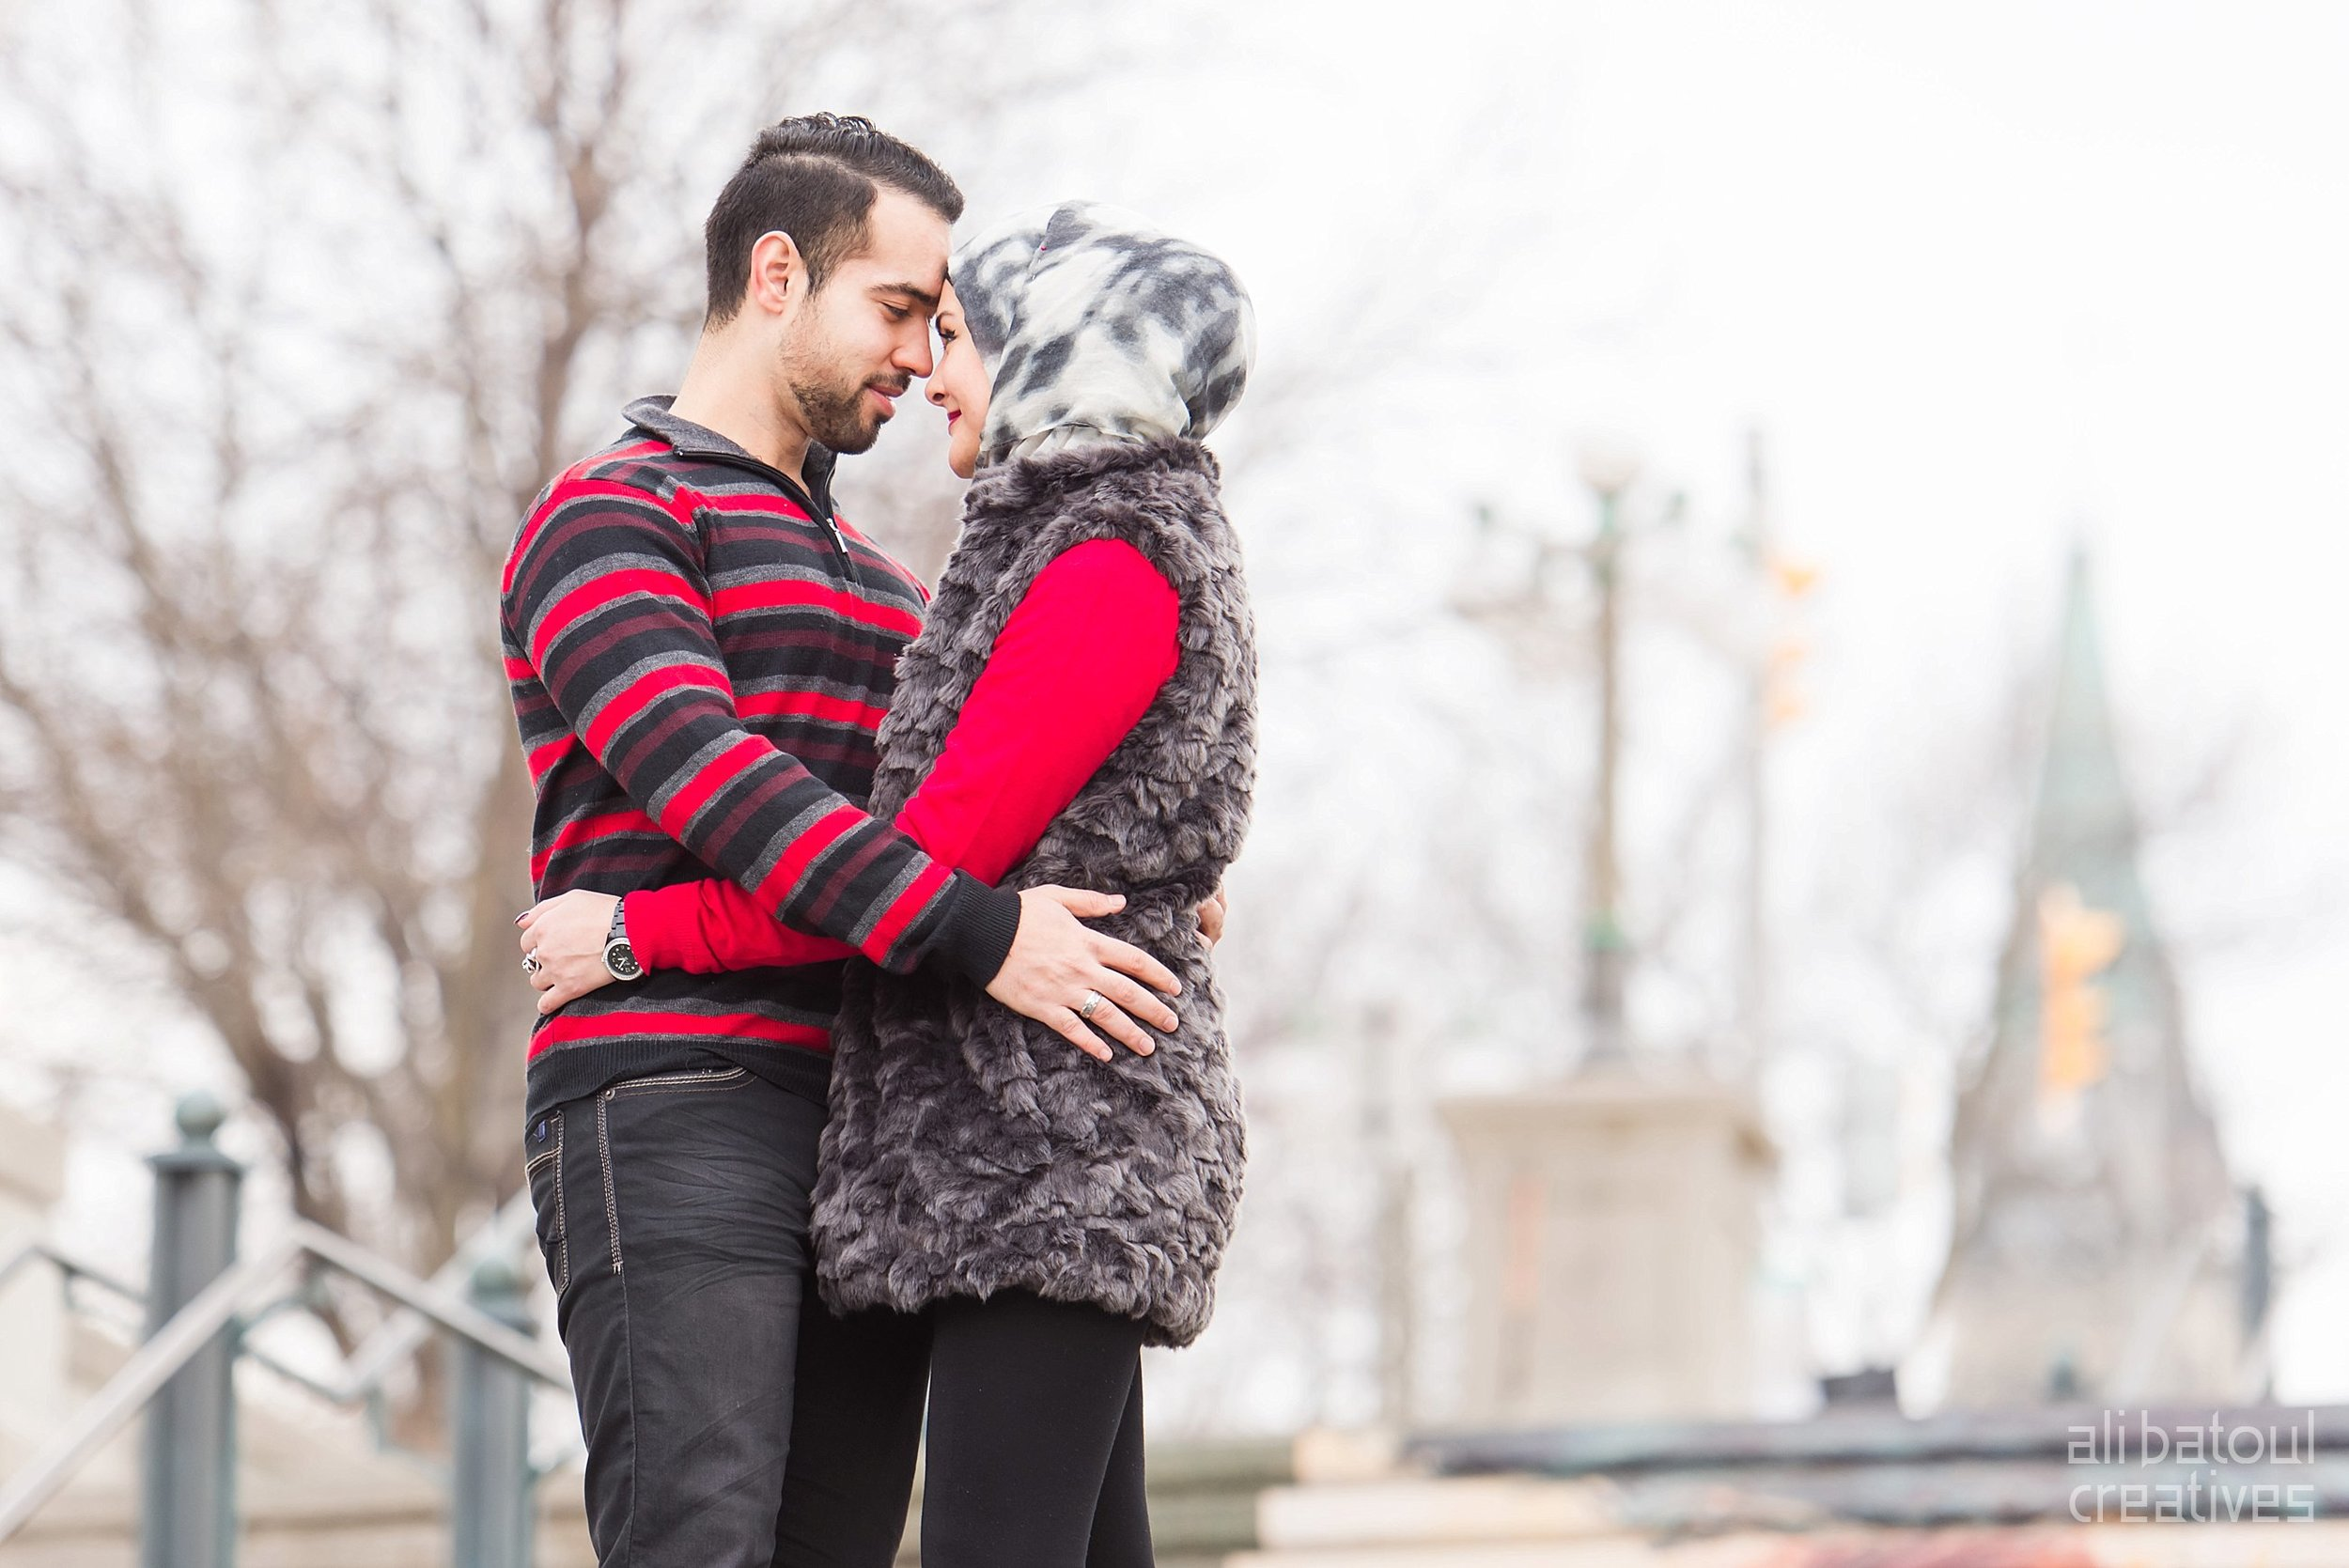 Hanan + Said Engagement  - Ali Batoul Creatives Photography_00001.jpg